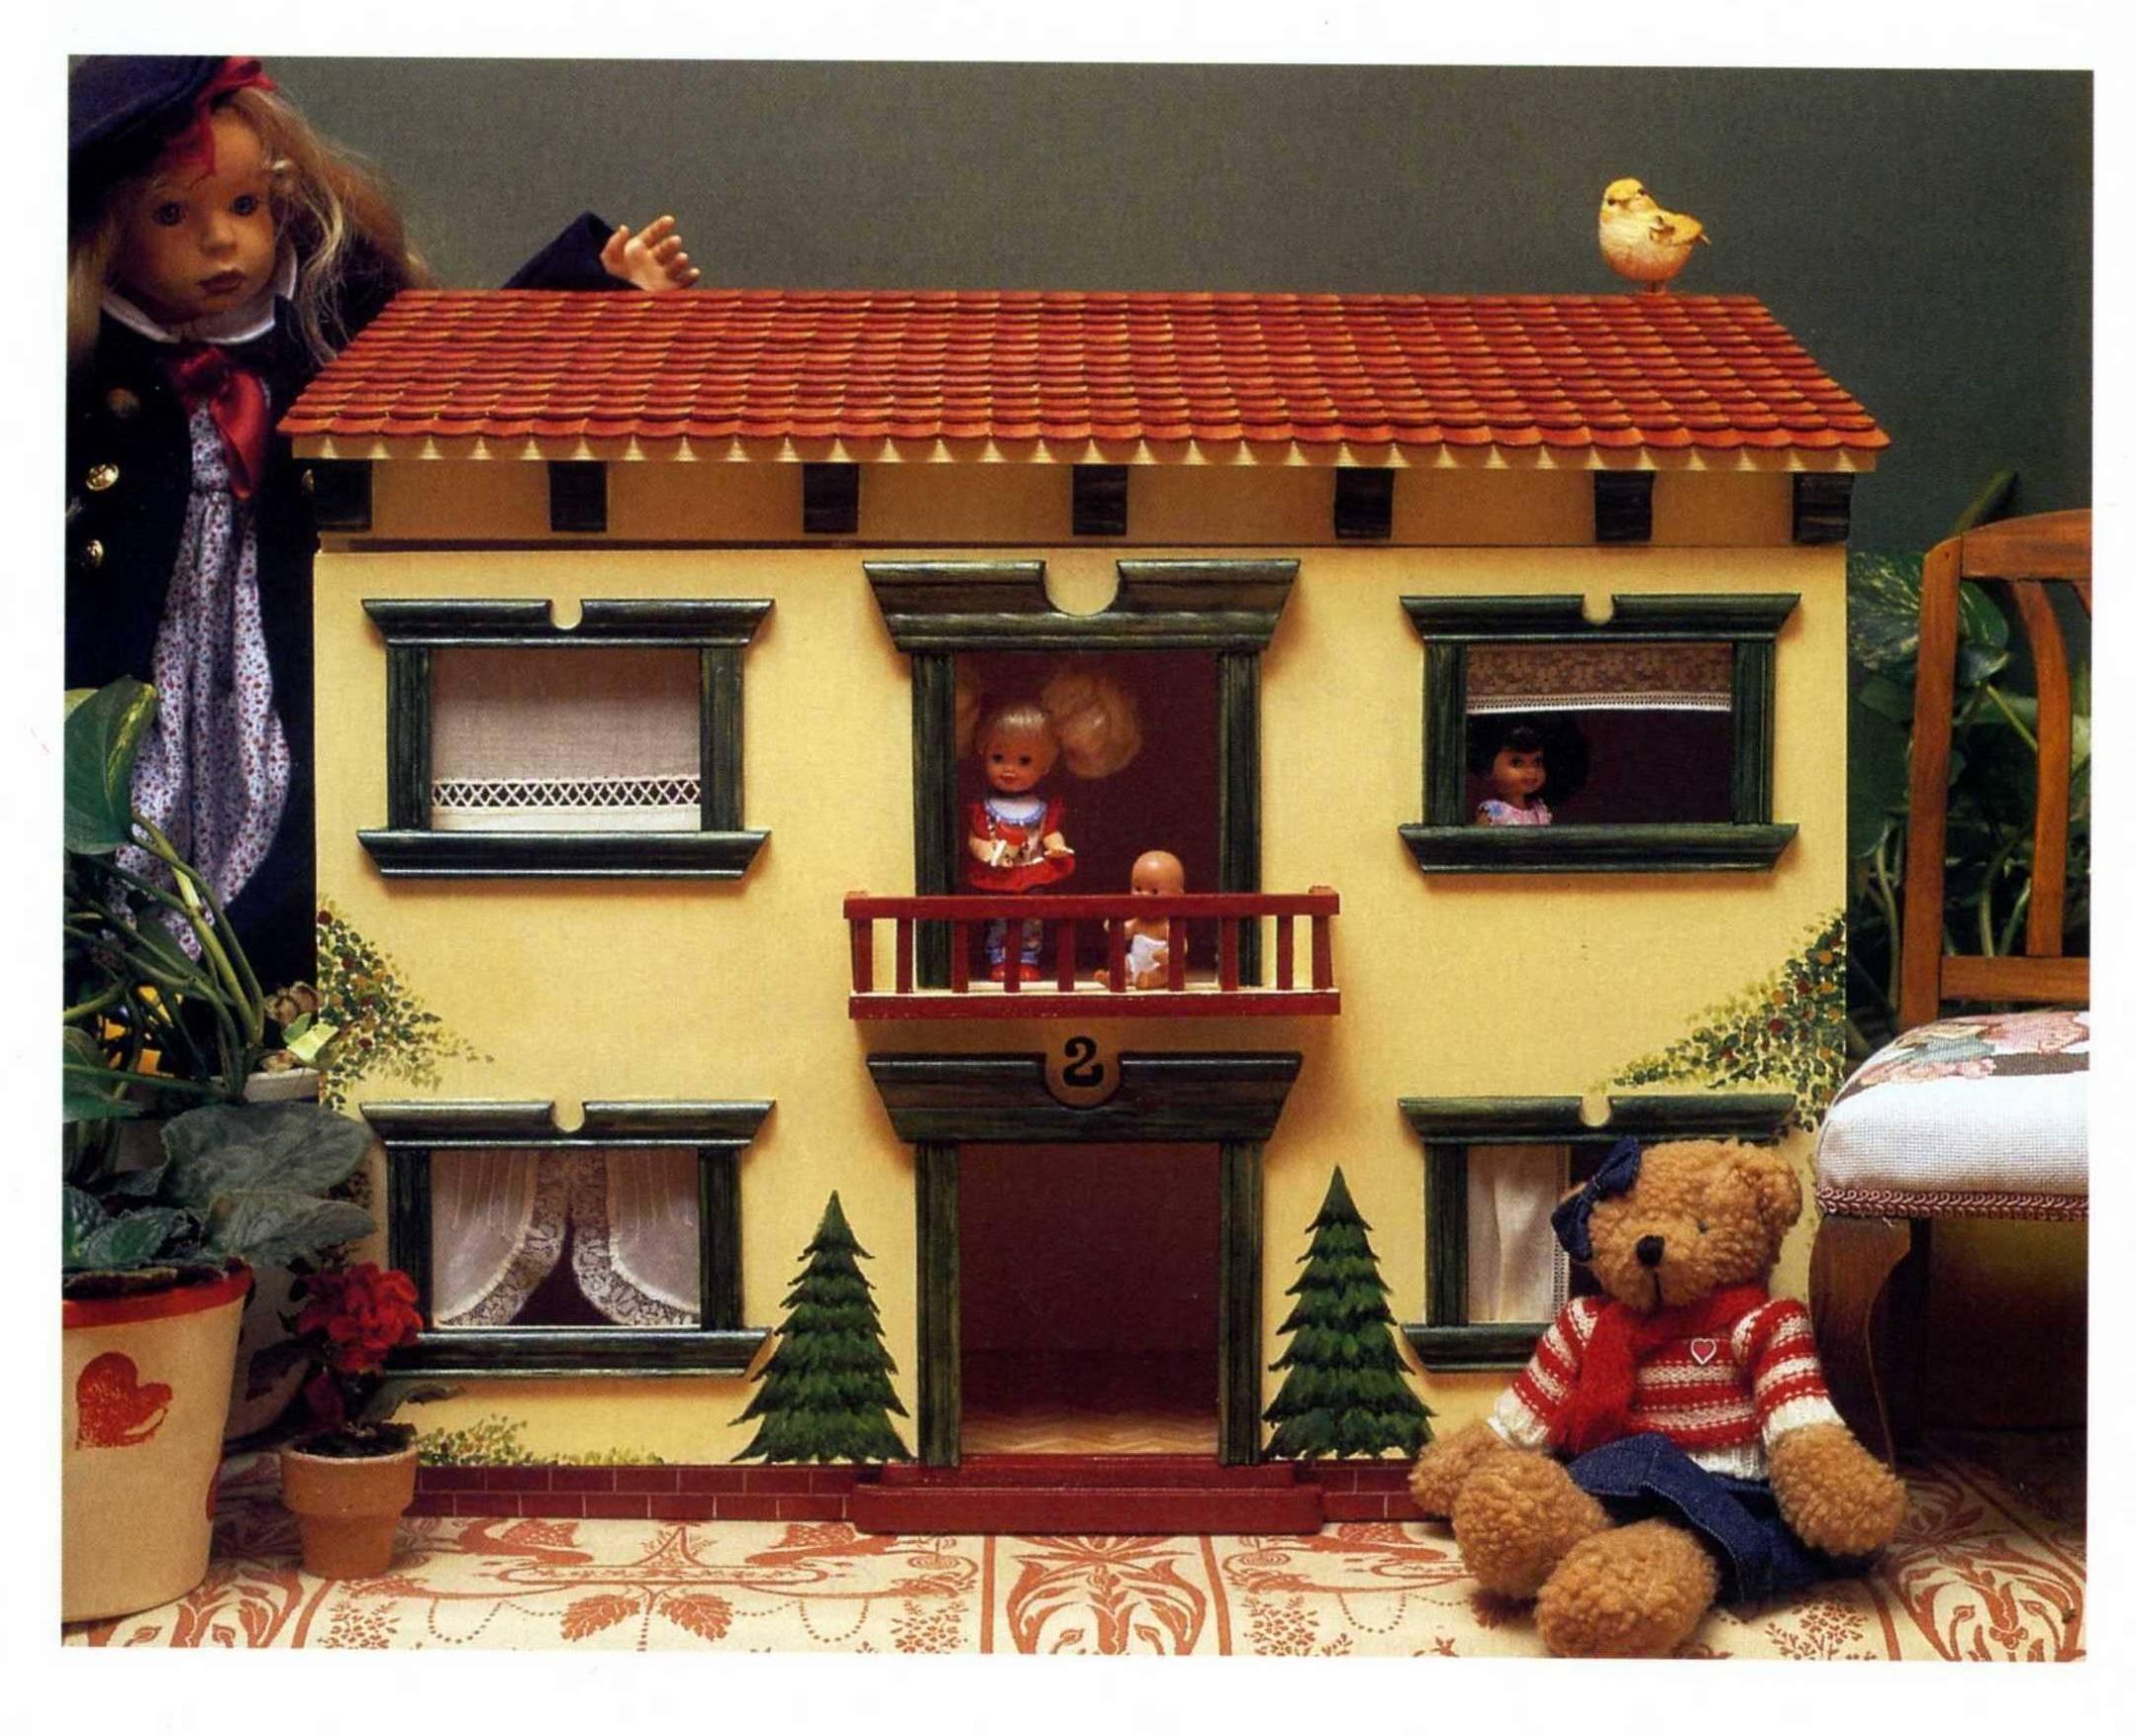 Casita de muñecas decorada